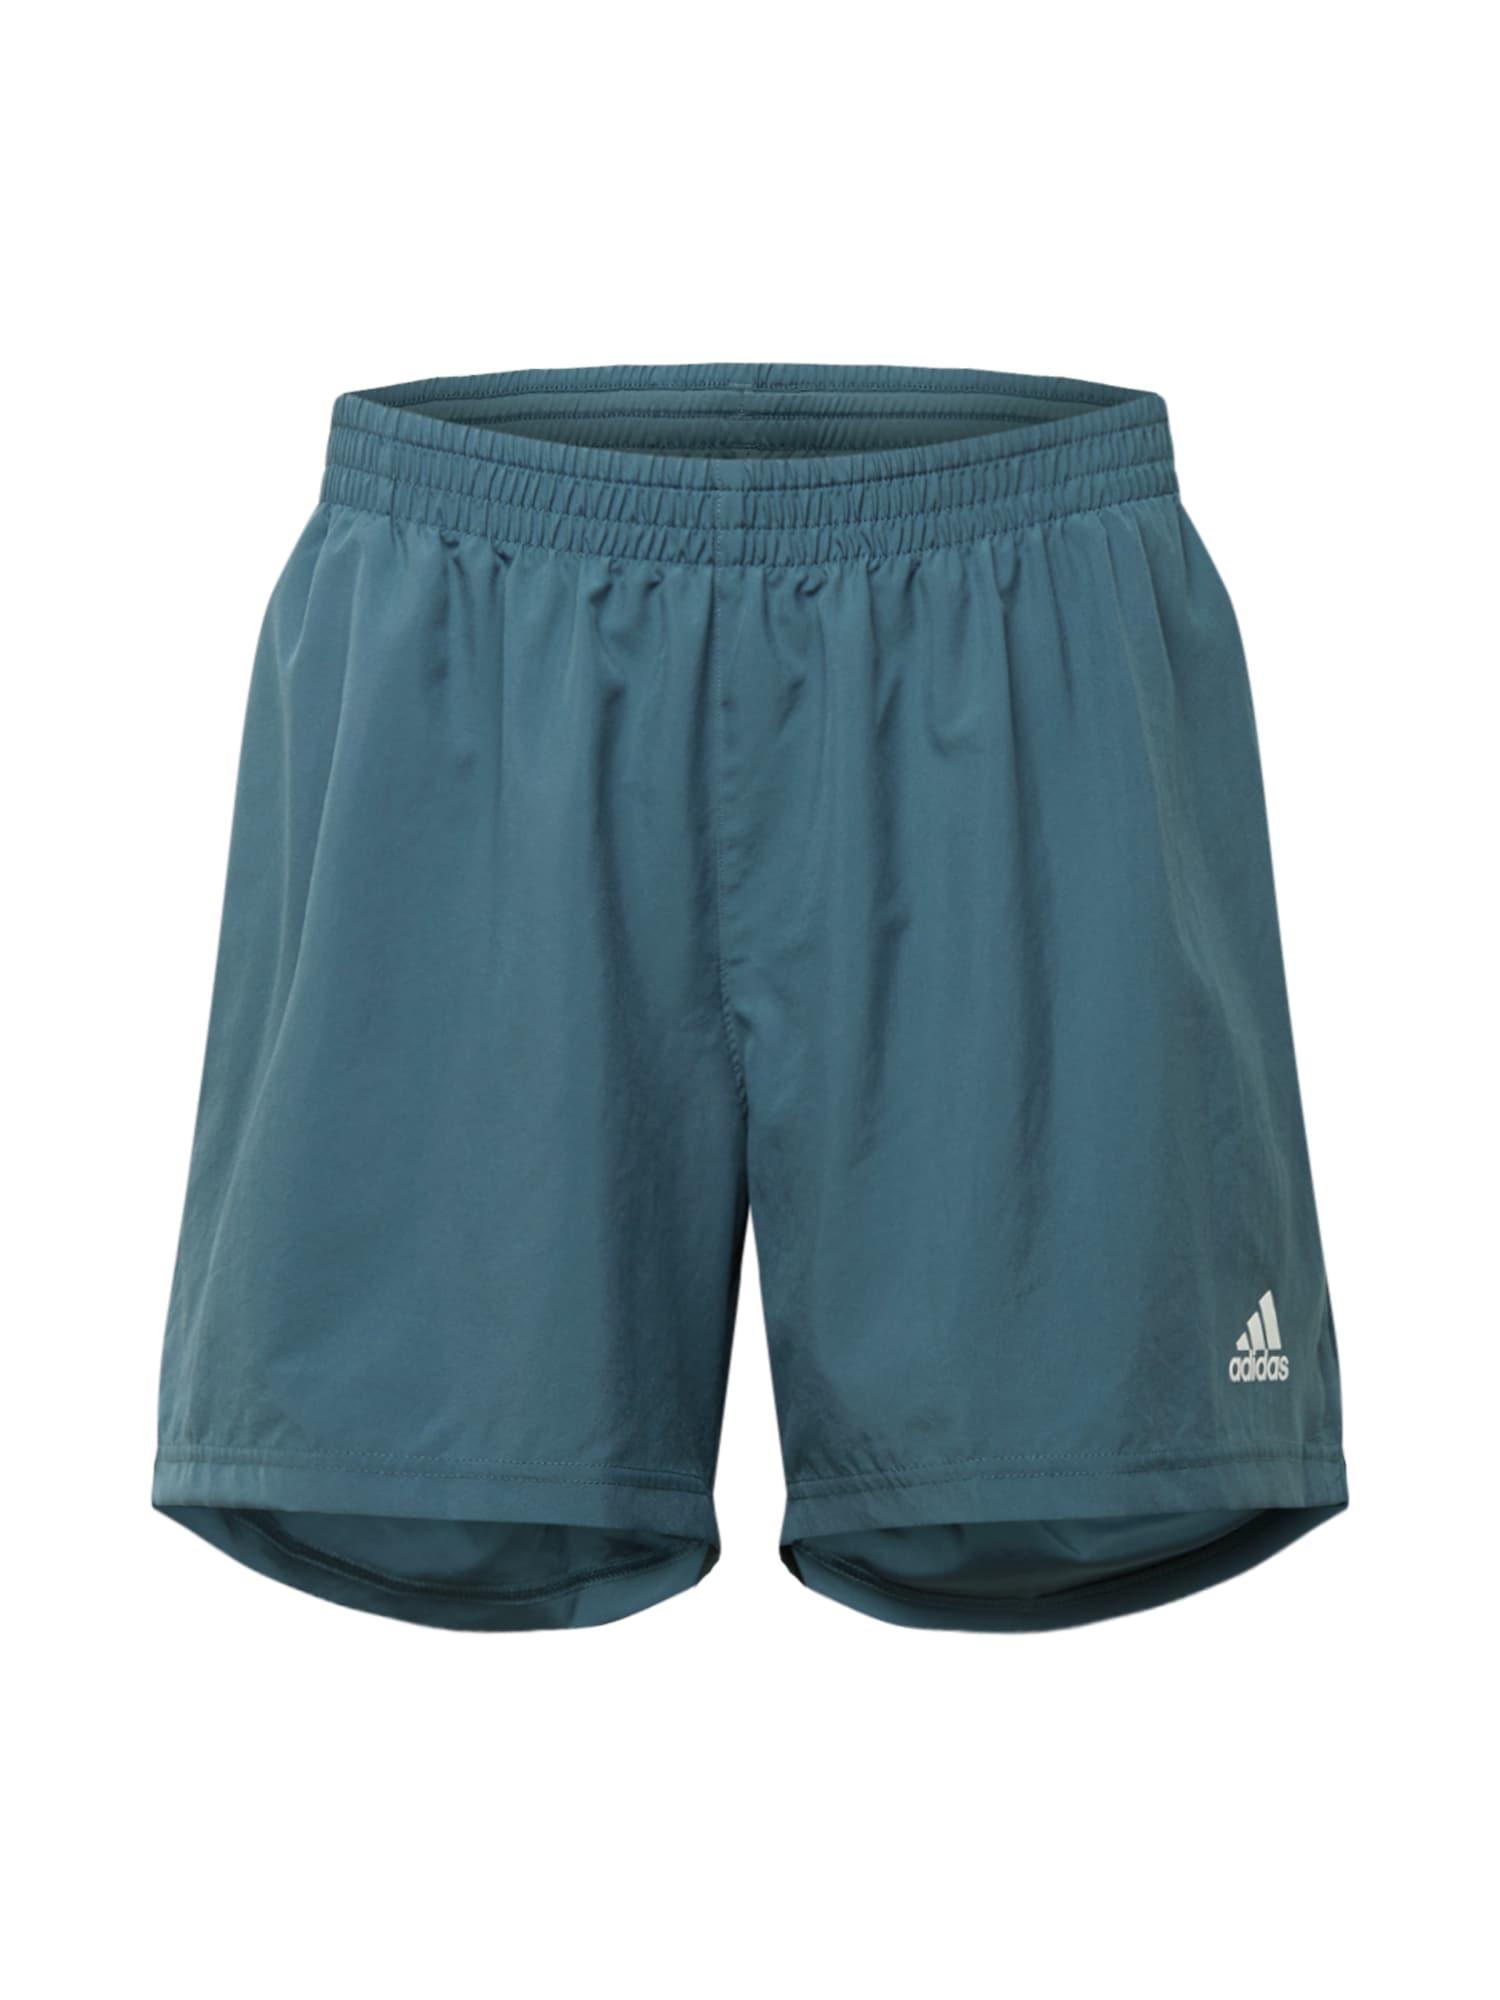 "ADIDAS PERFORMANCE Sportovní kalhoty 'Run It Pb 5""'  tmavě modrá / bílá"